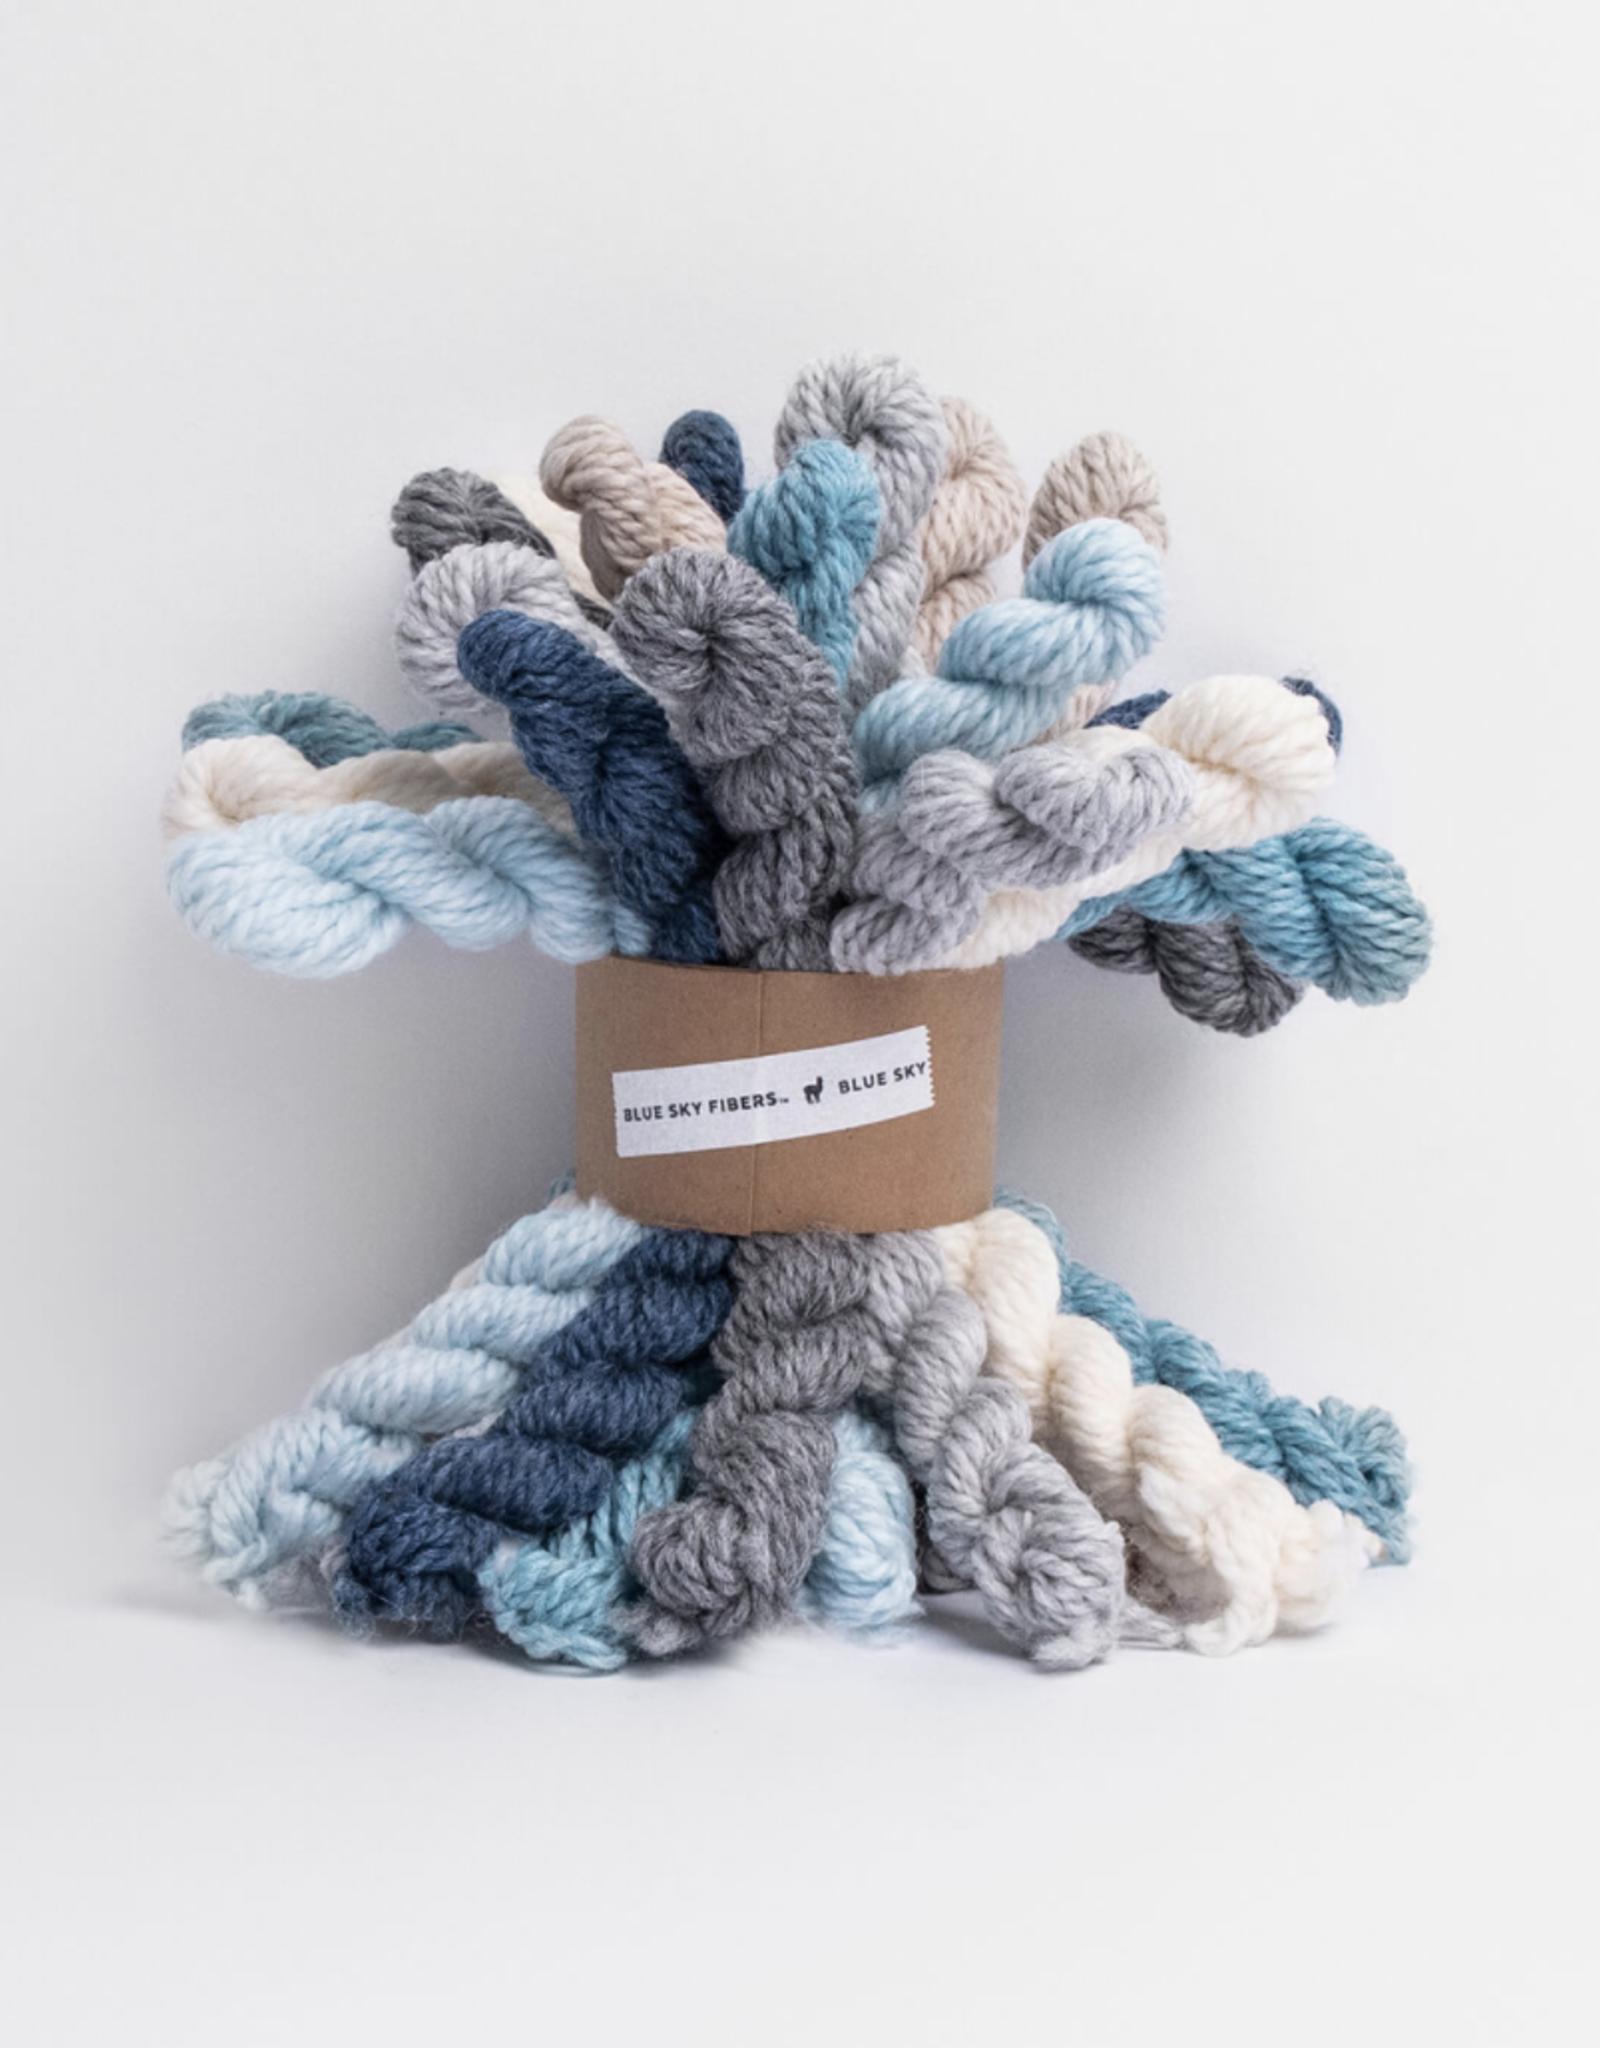 Blue Sky Fibers Woolstok Bundle Kit